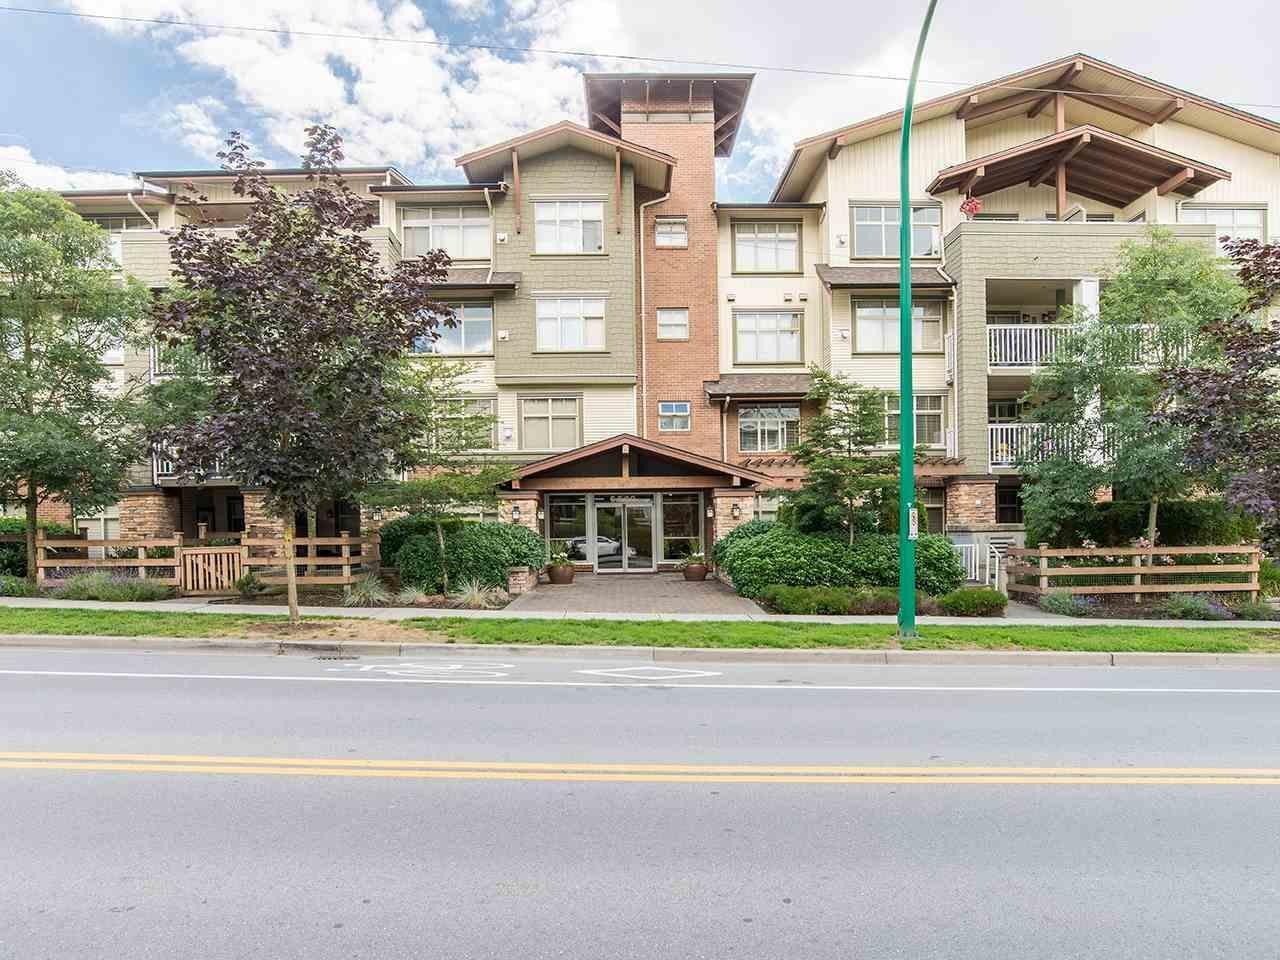 R2140487 - 402 6500 194 STREET, Clayton, Surrey, BC - Apartment Unit